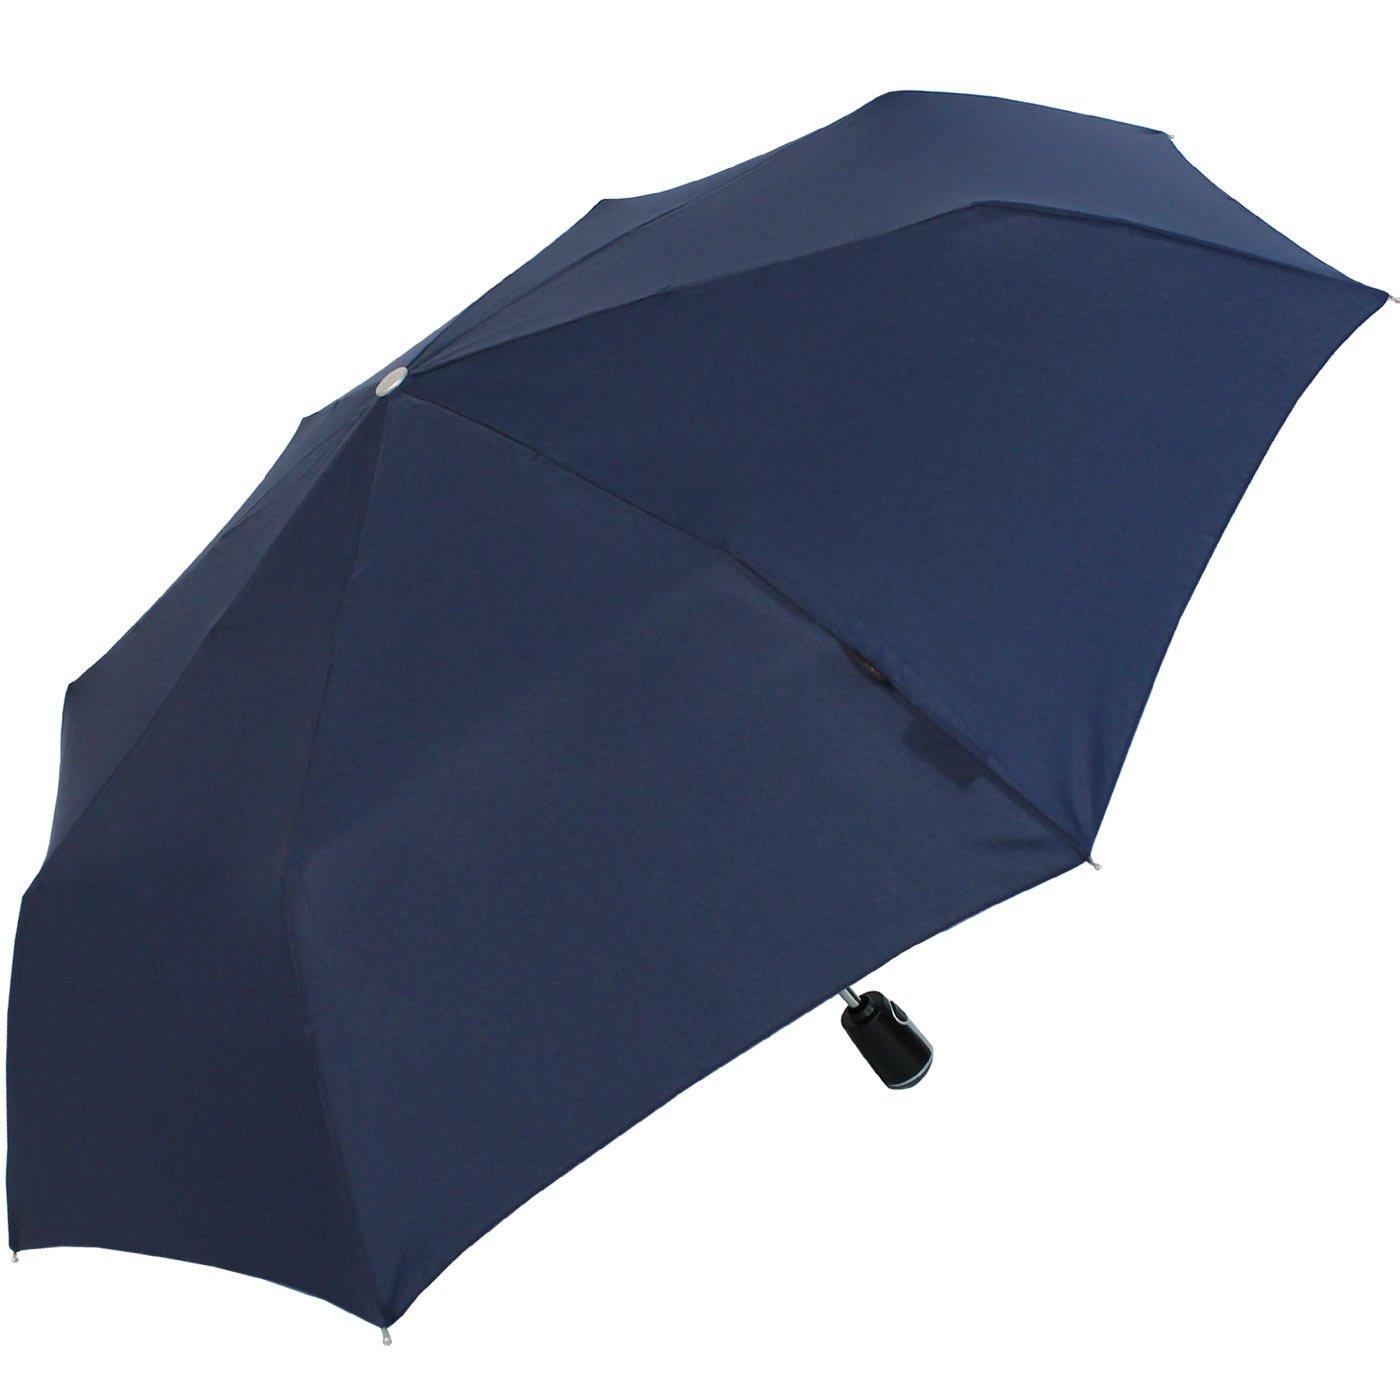 Knirps Duomatic - Paraguas grande de bolsillo Azul azul marino 97 cm: Amazon.es: Equipaje